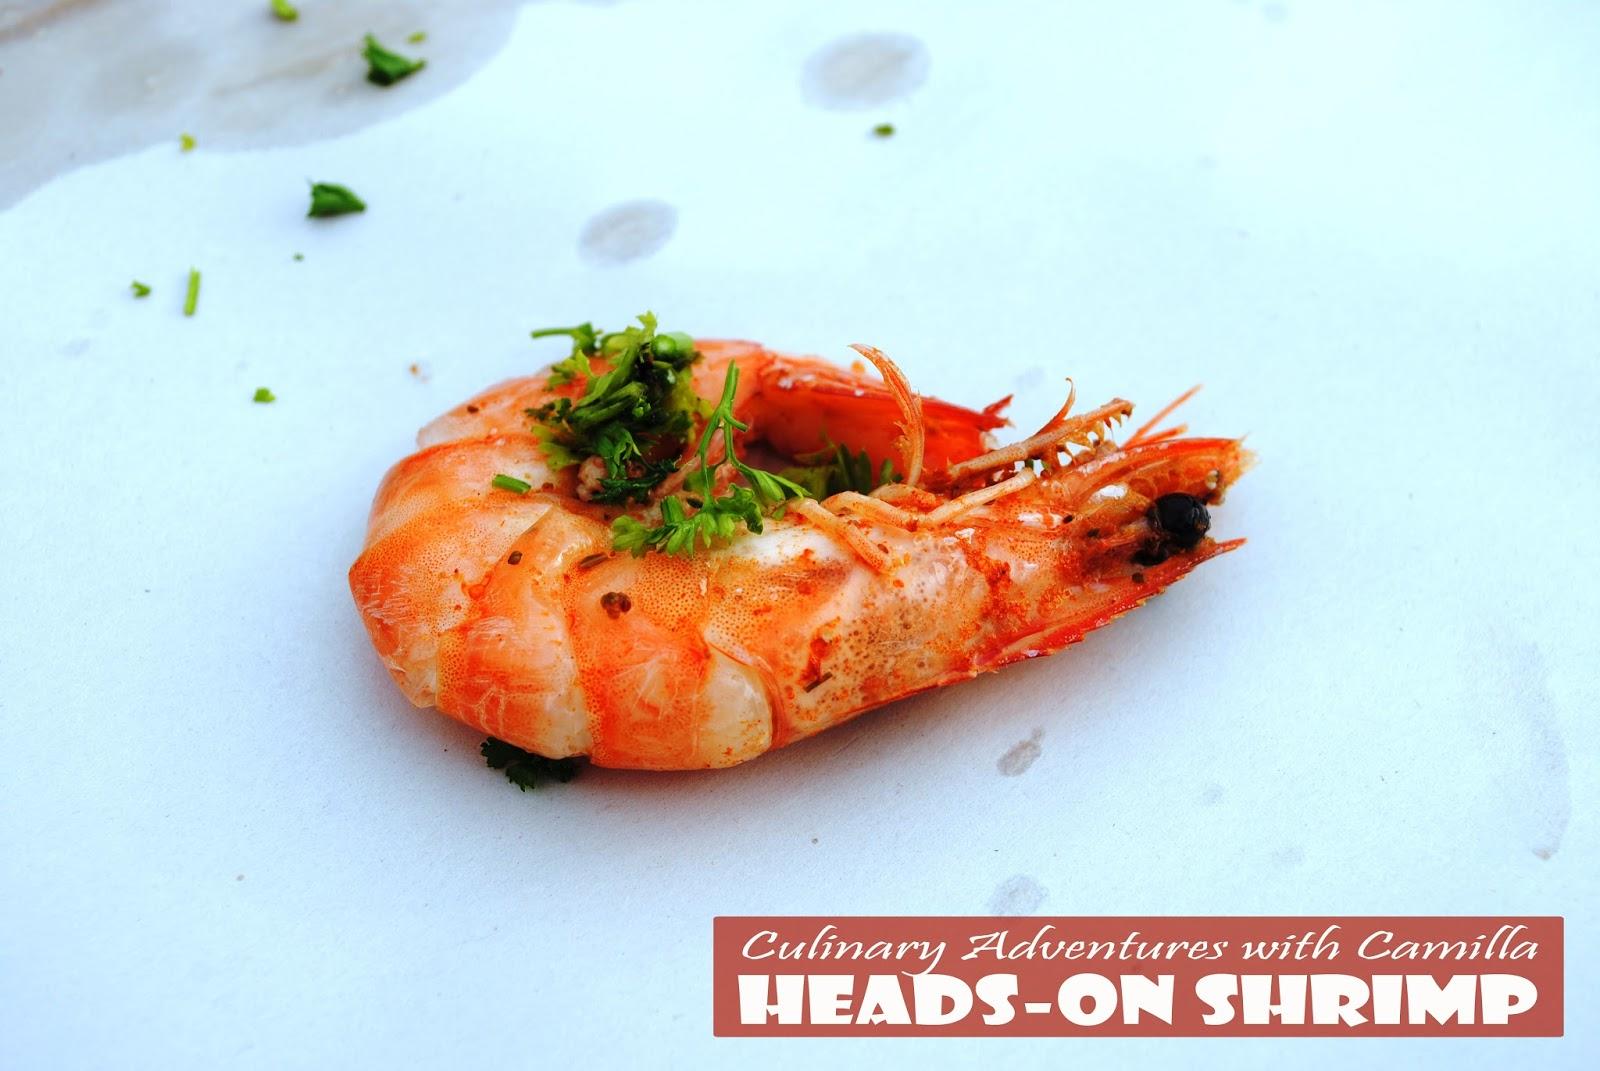 How to eat shrimp